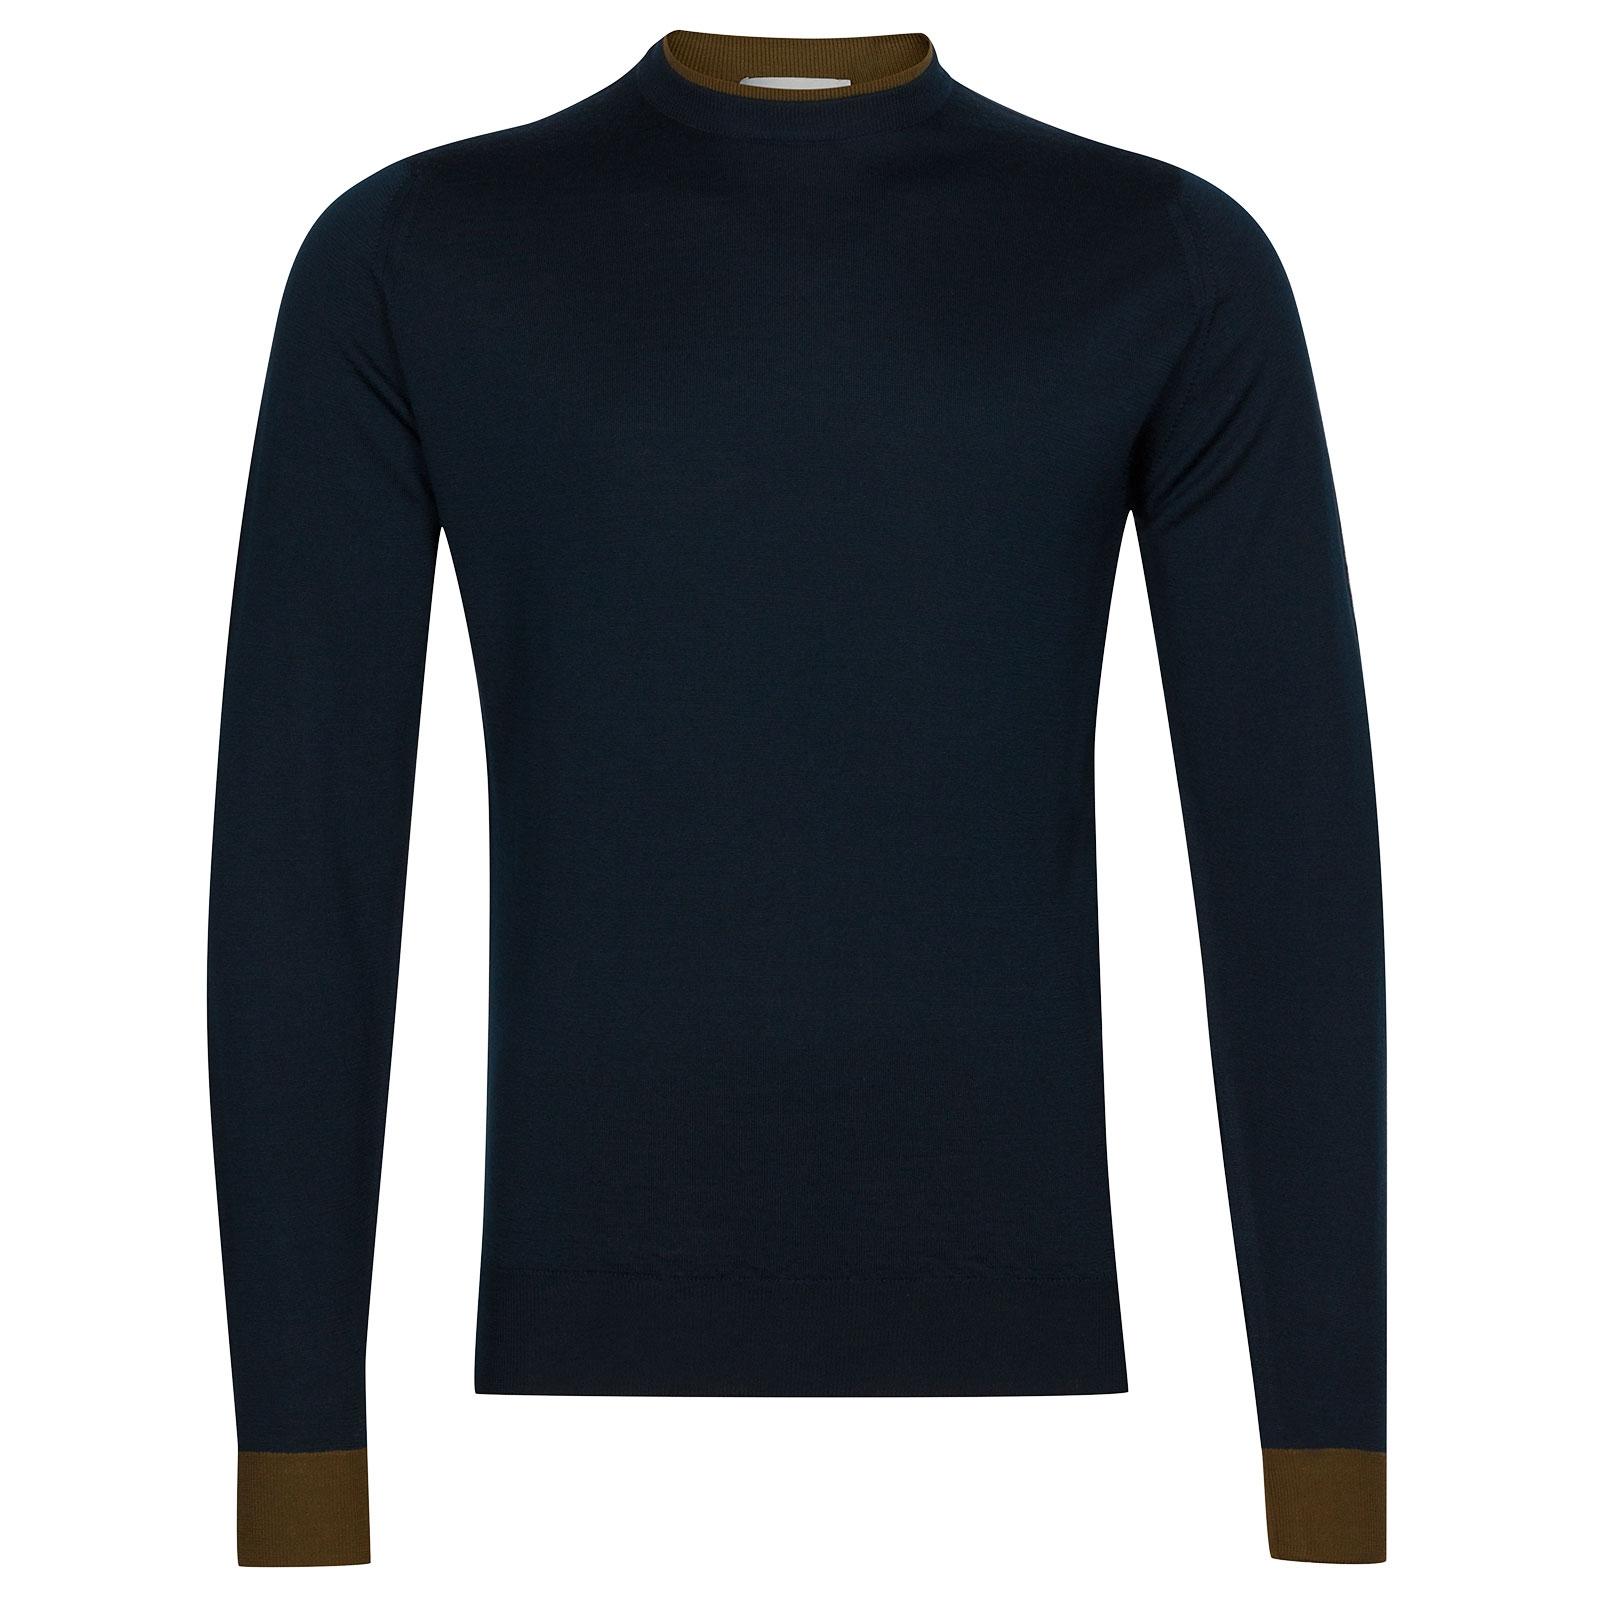 John Smedley Kenn Extra Fine Merino Pullover in Orion Green-S